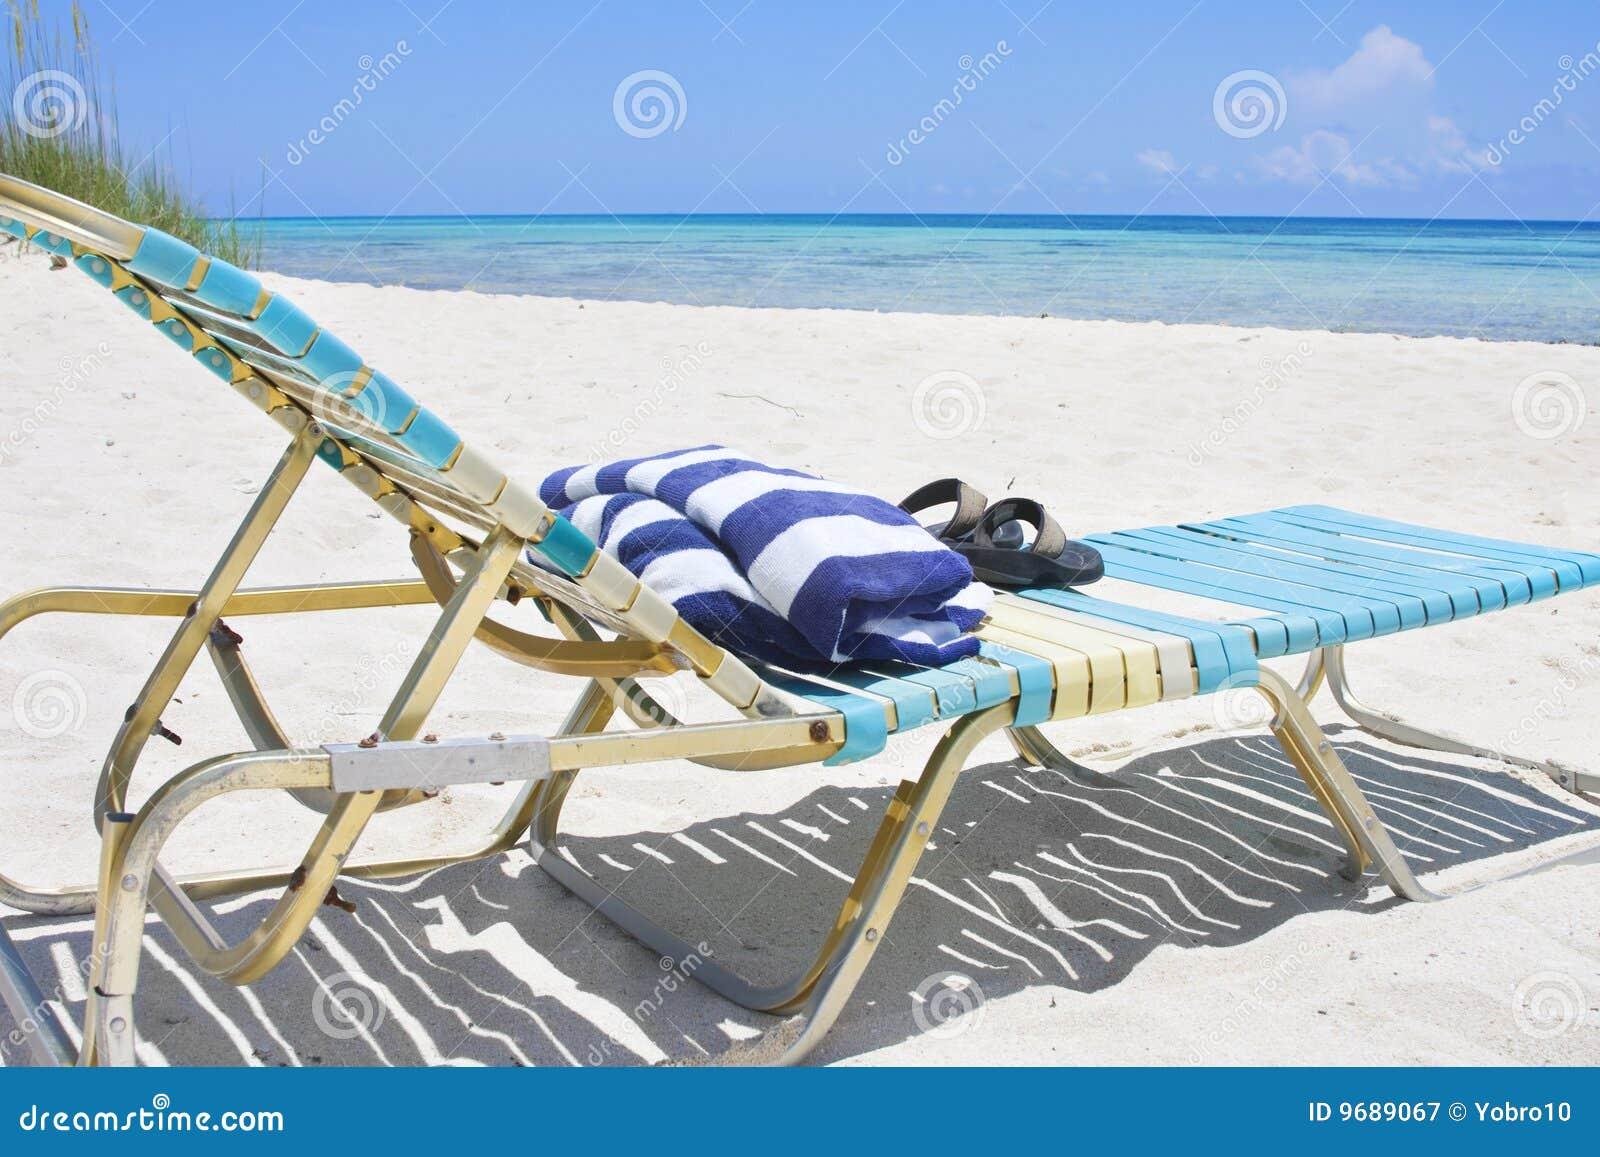 Beach lounge chair - Royalty Free Stock Photo